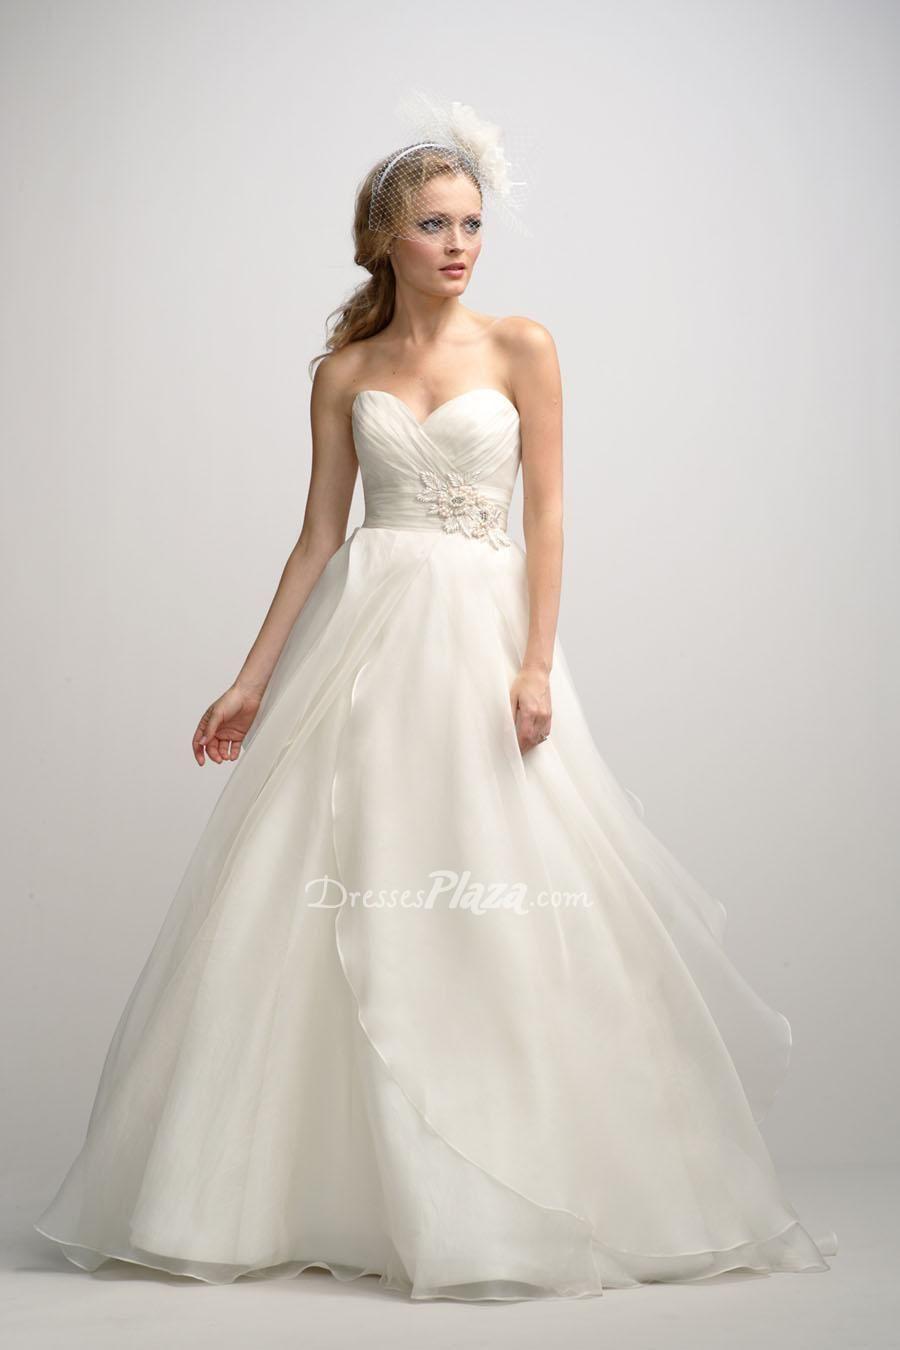 wedding dress skirt Organza Sweetheart Strapless Ball Gown Ruched Bodice Asymmetrical Overlay Skirt Wedding Dress at Dressesplaza com